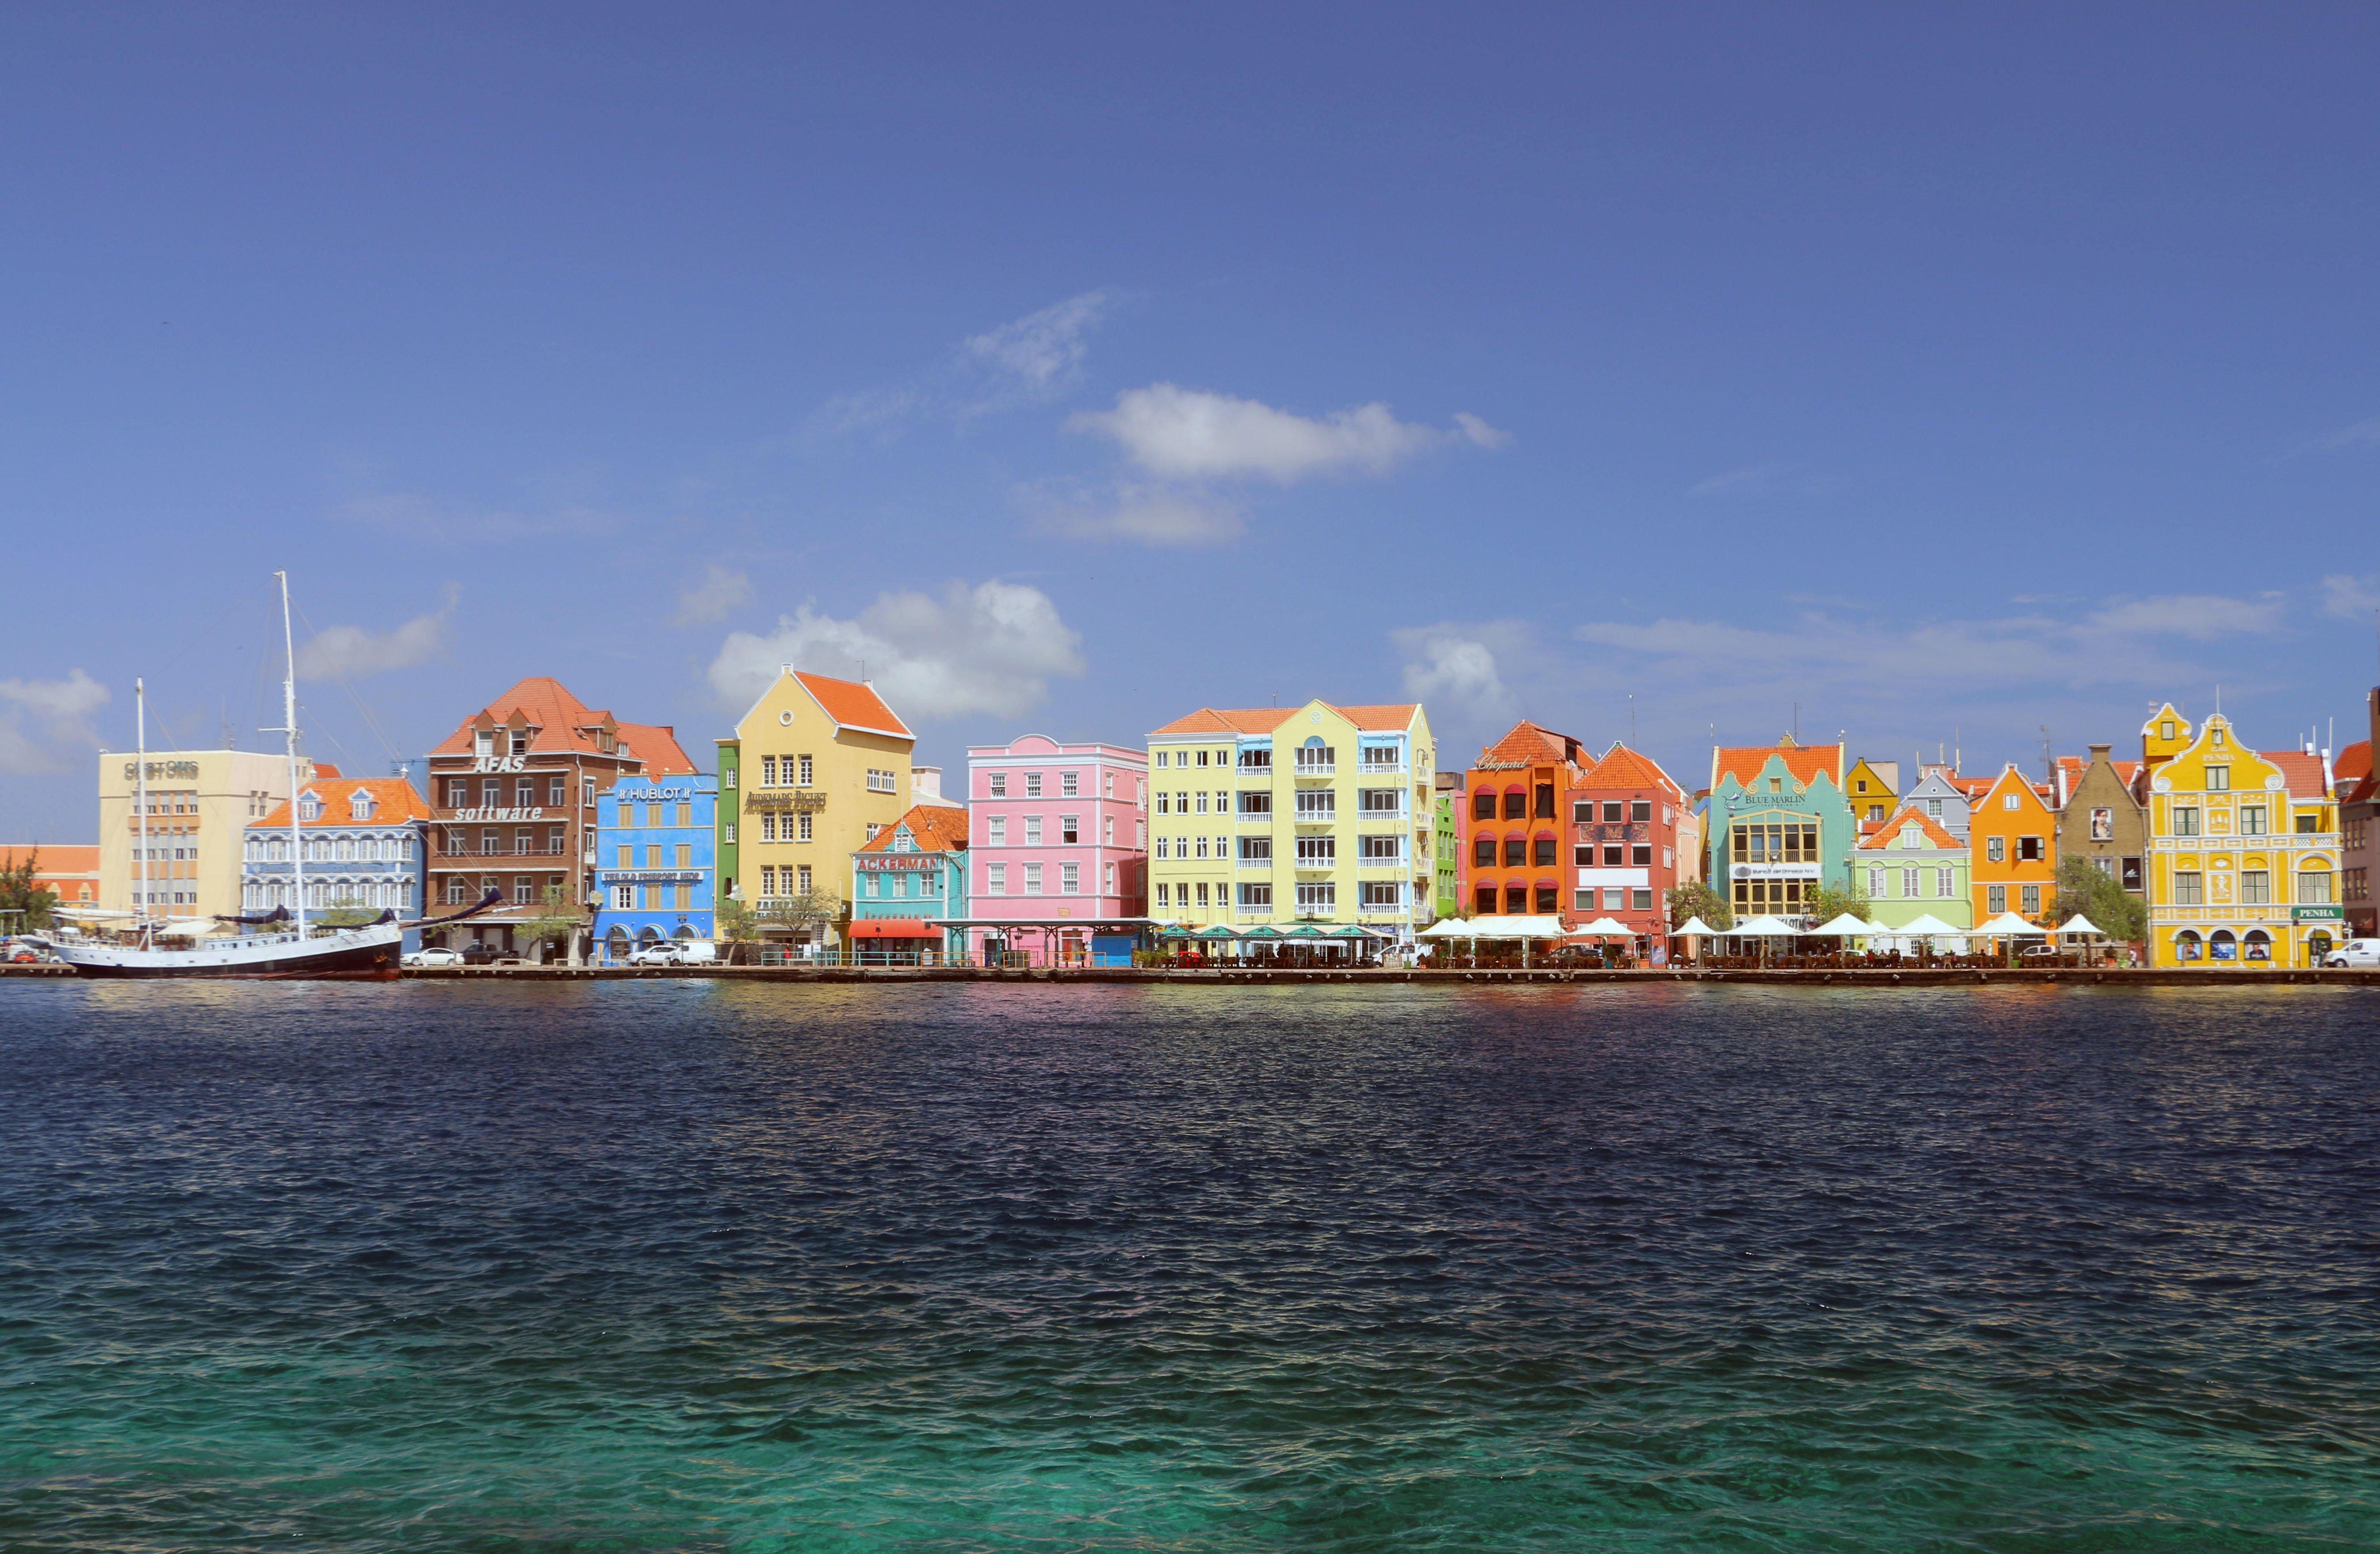 Handelskade Willemstad Curacao Netherlands Antilles